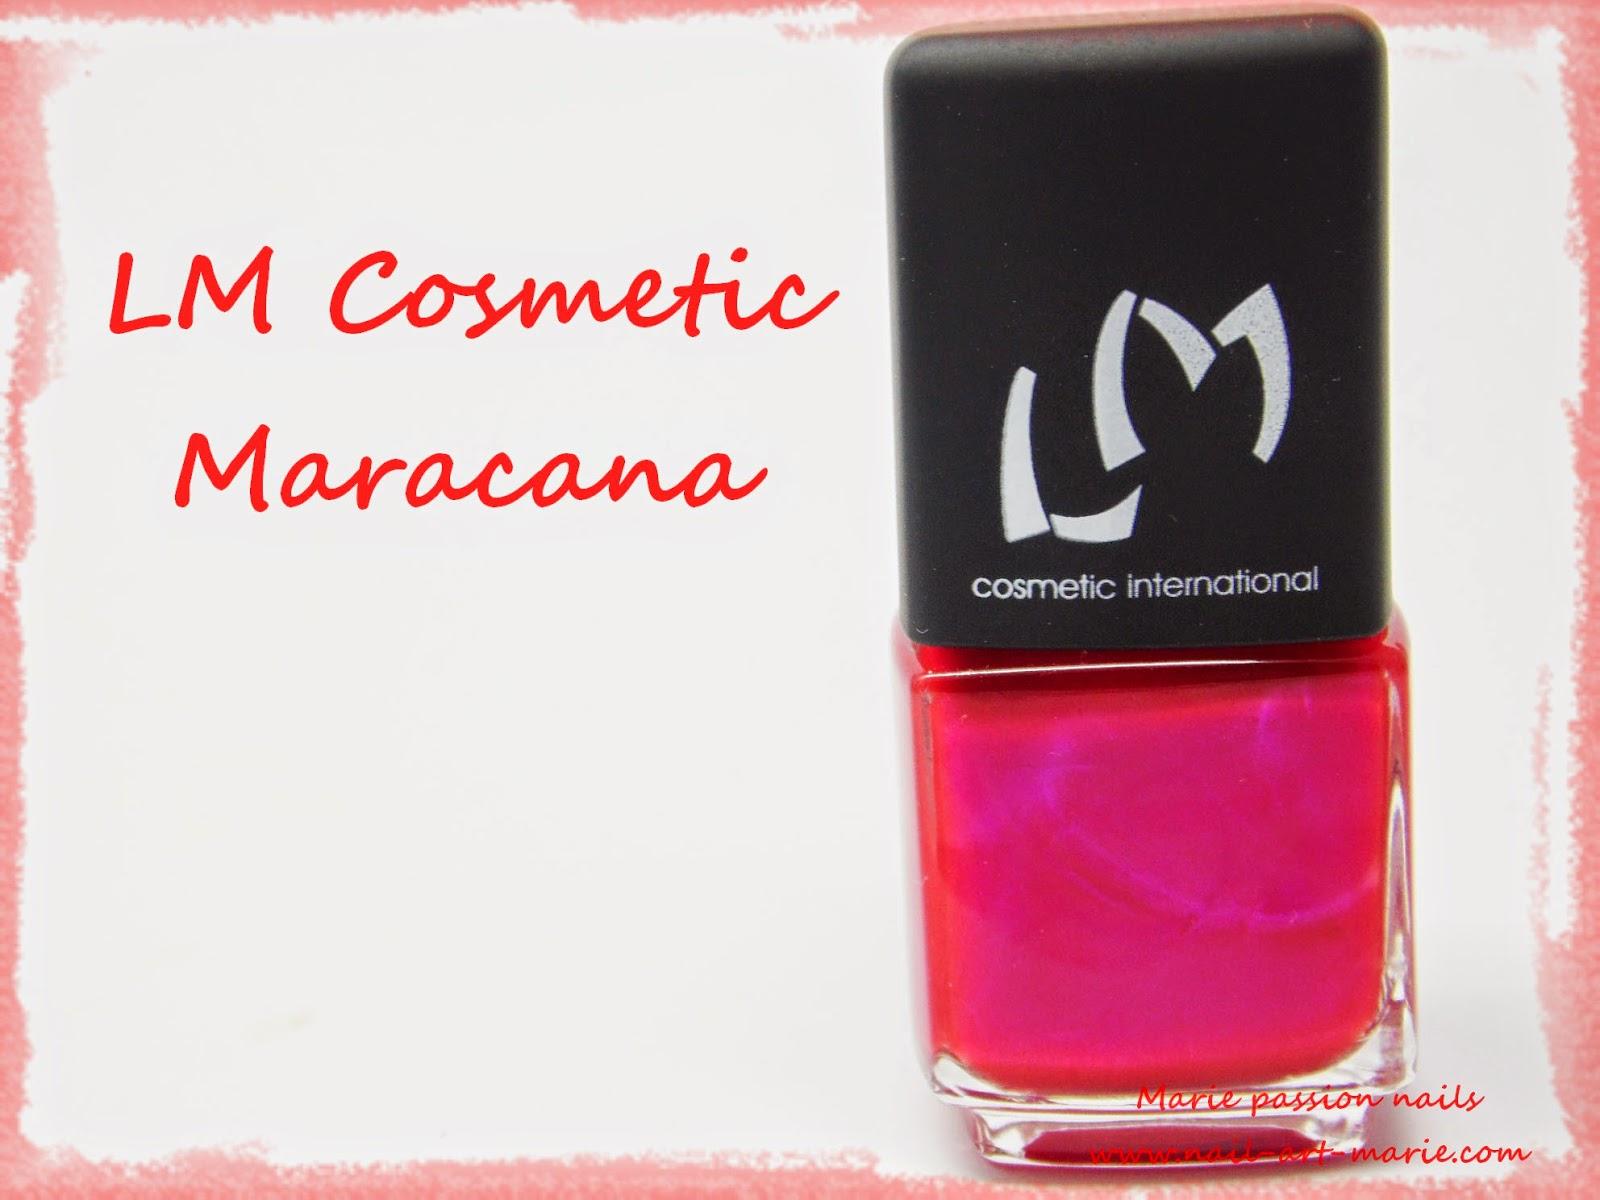 LM Cosmetic Maracana1